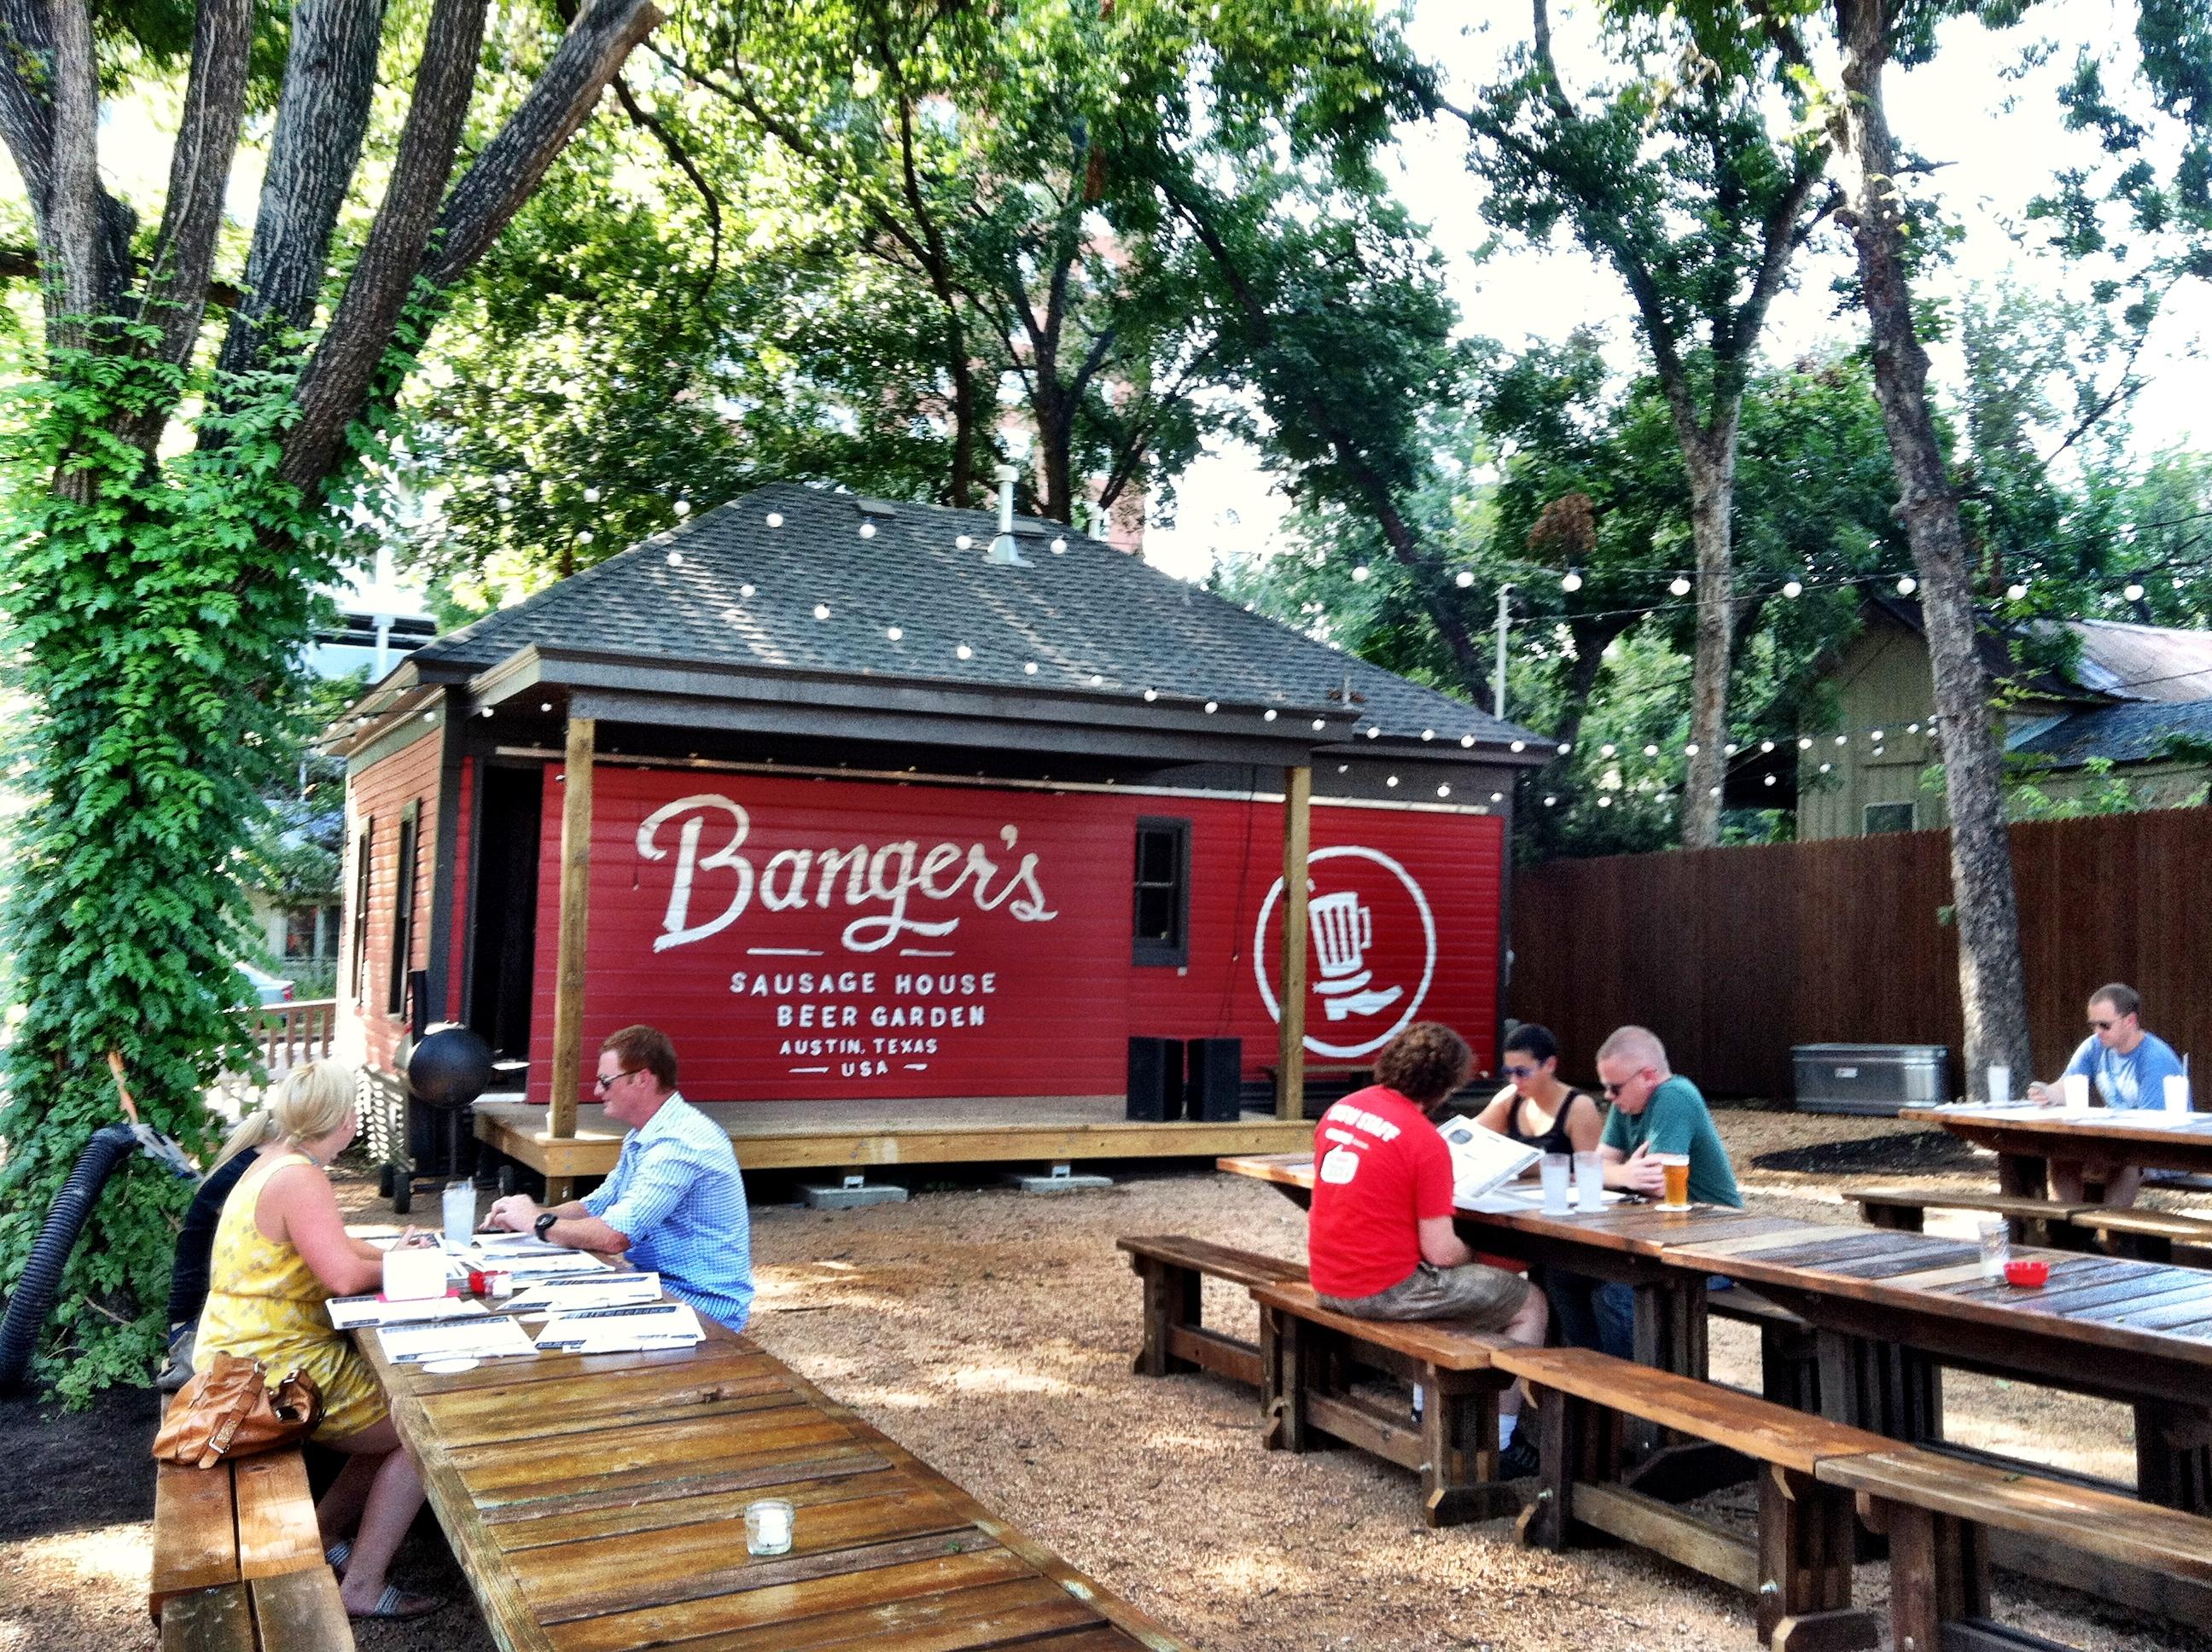 outside garage wall ideas - Genius Tap Banger's Sausage House & Beer Garden